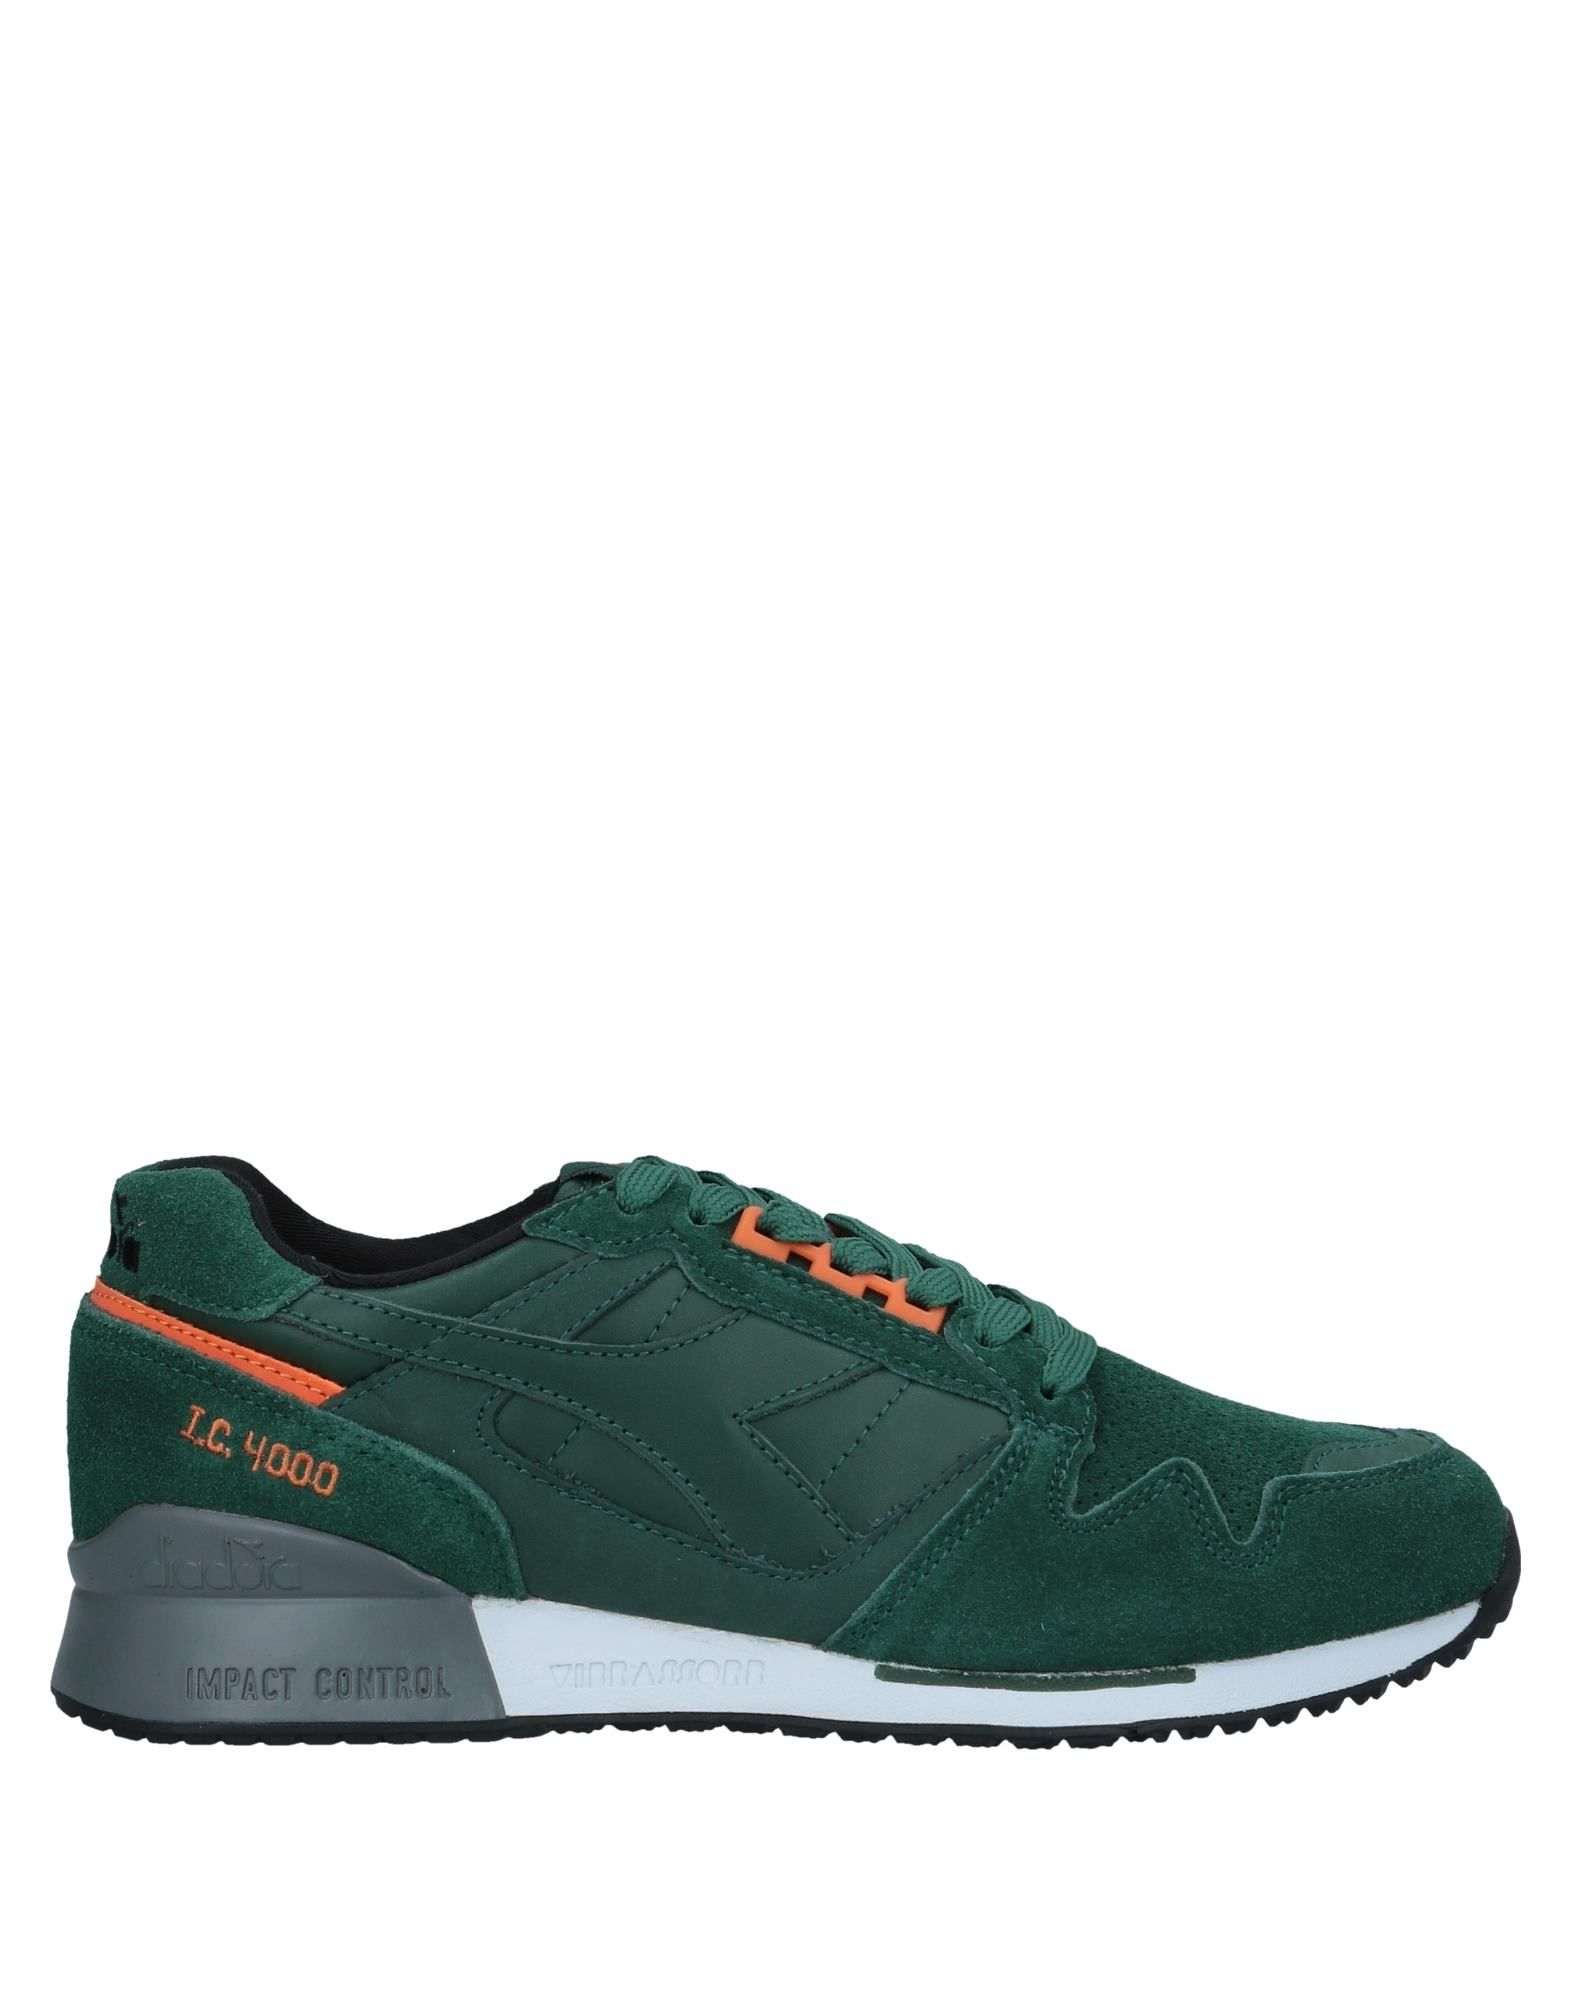 Moda Sneakers Diadora Uomo - 11500744LT 11500744LT - 0b8c03